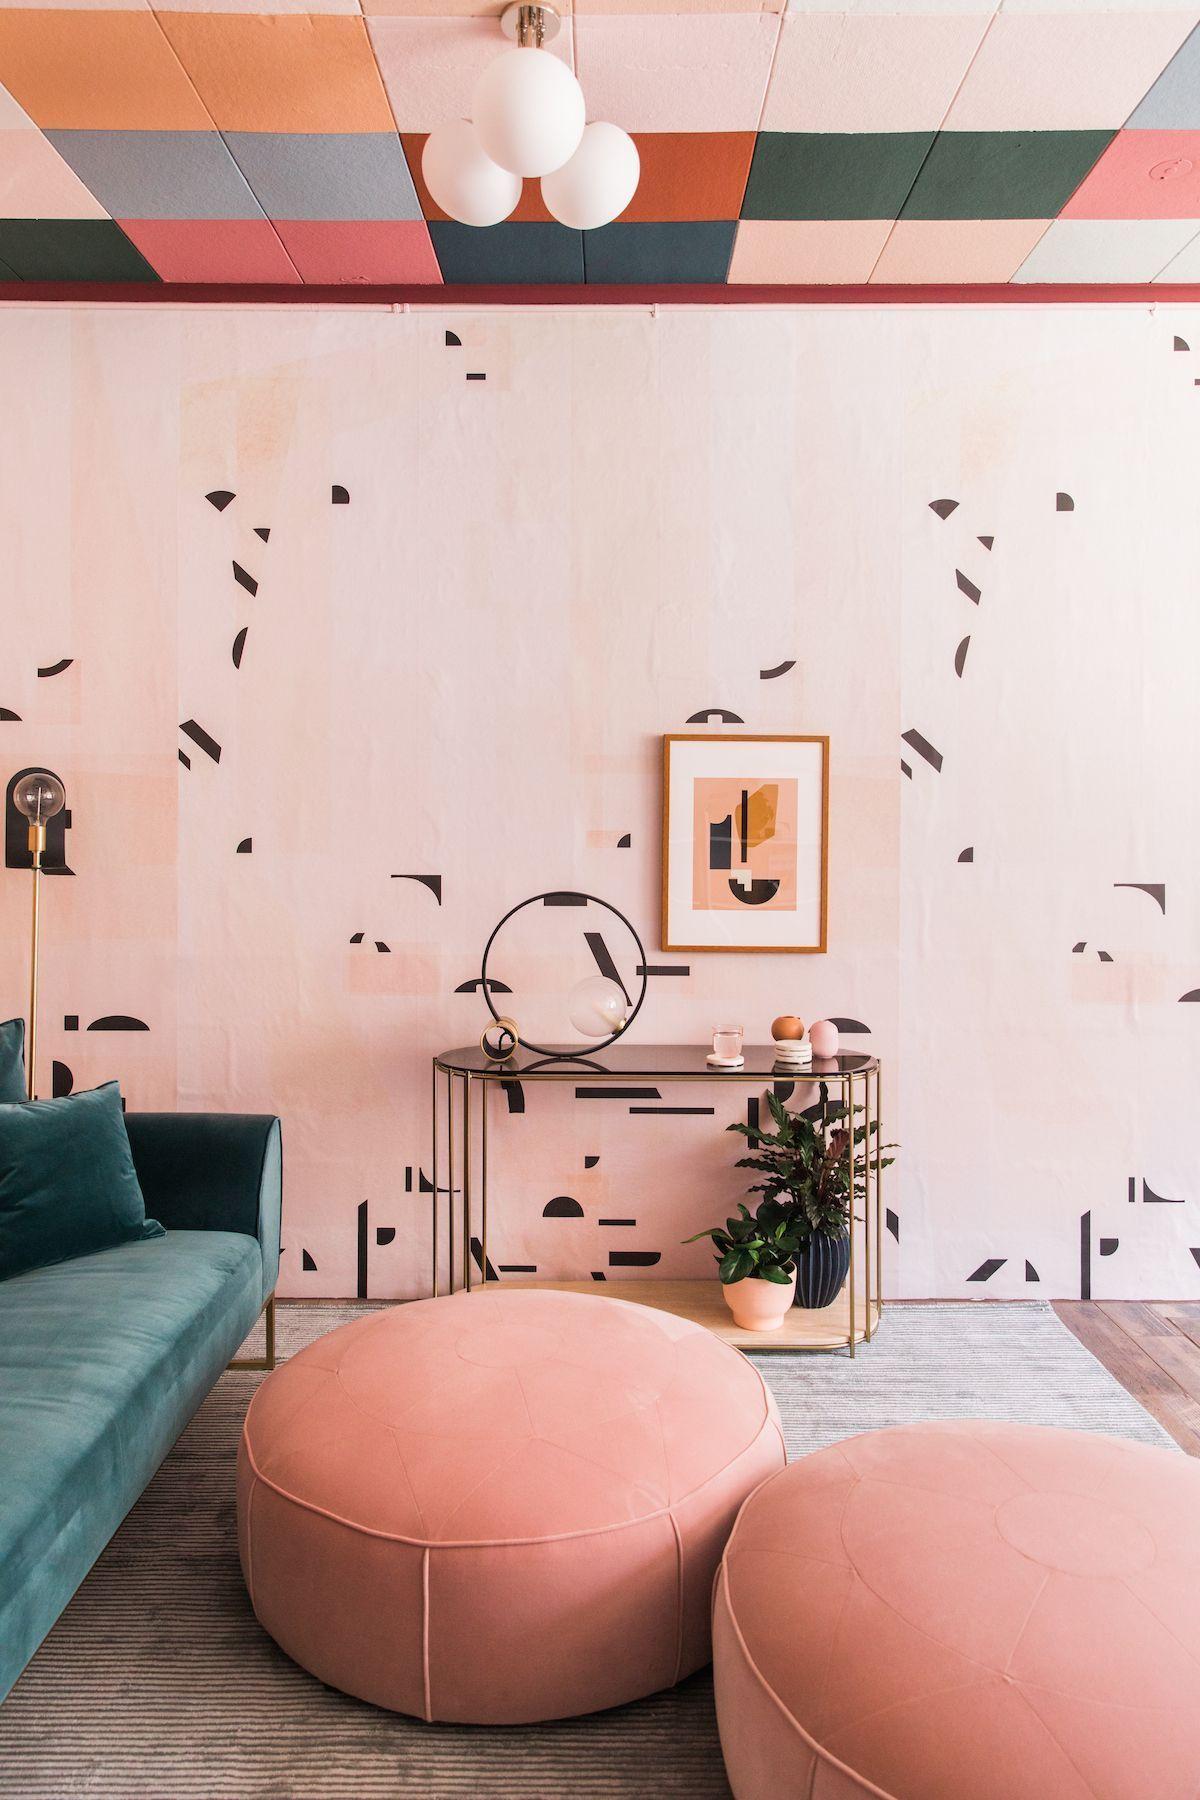 24 Beautiful Art Deco Home Interiors #artdecointerior